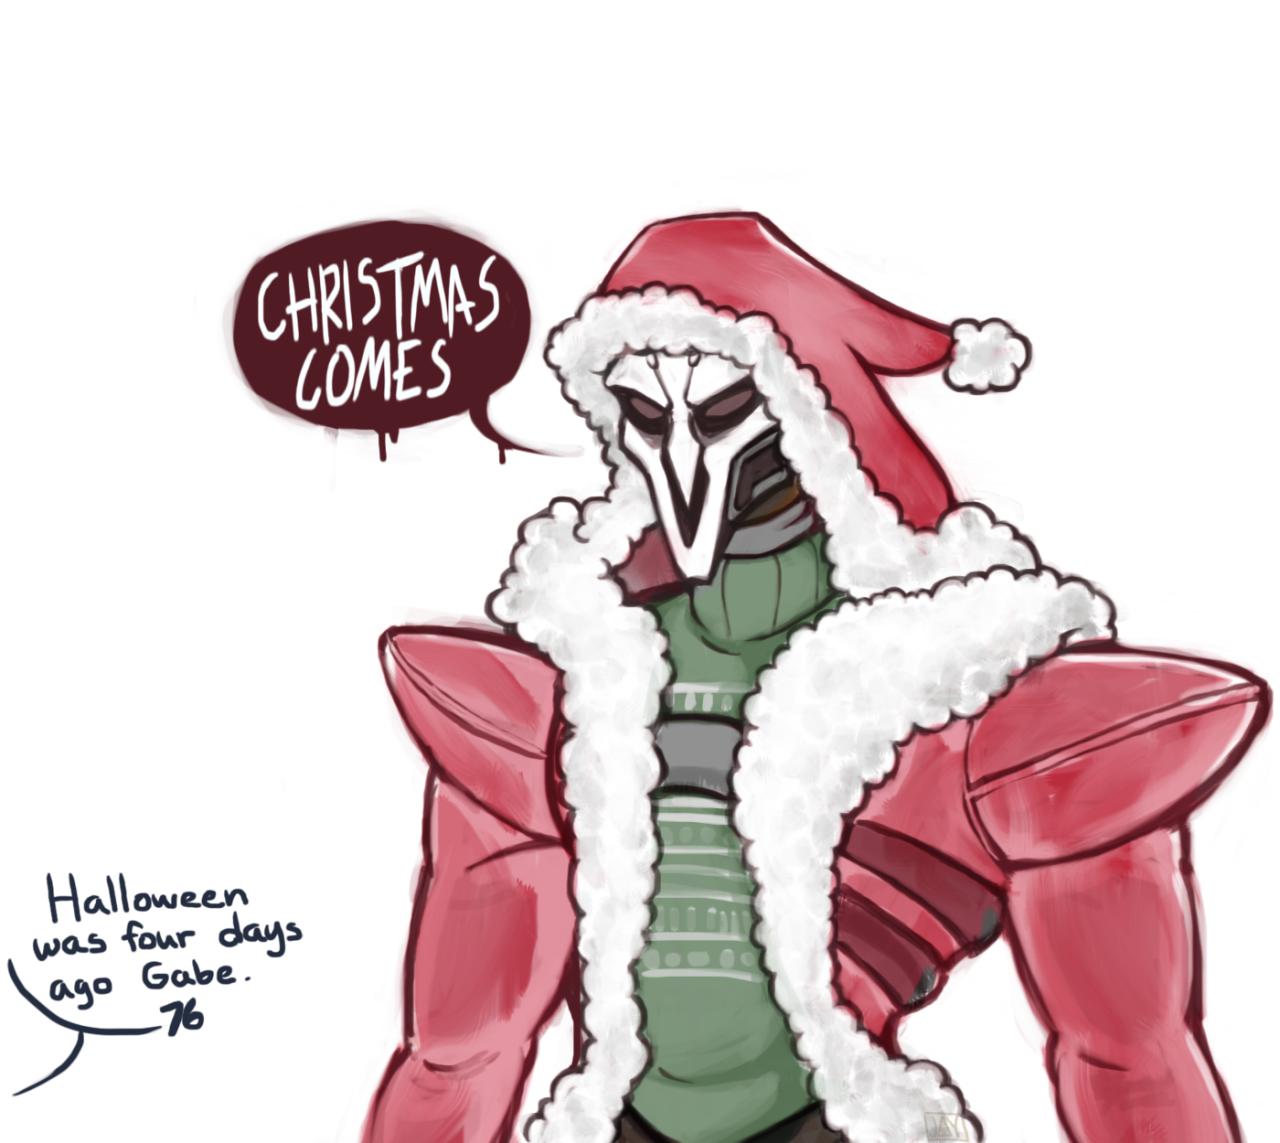 Overwatch fan art - The Reaper of Christmas   .OVERWATCH ...